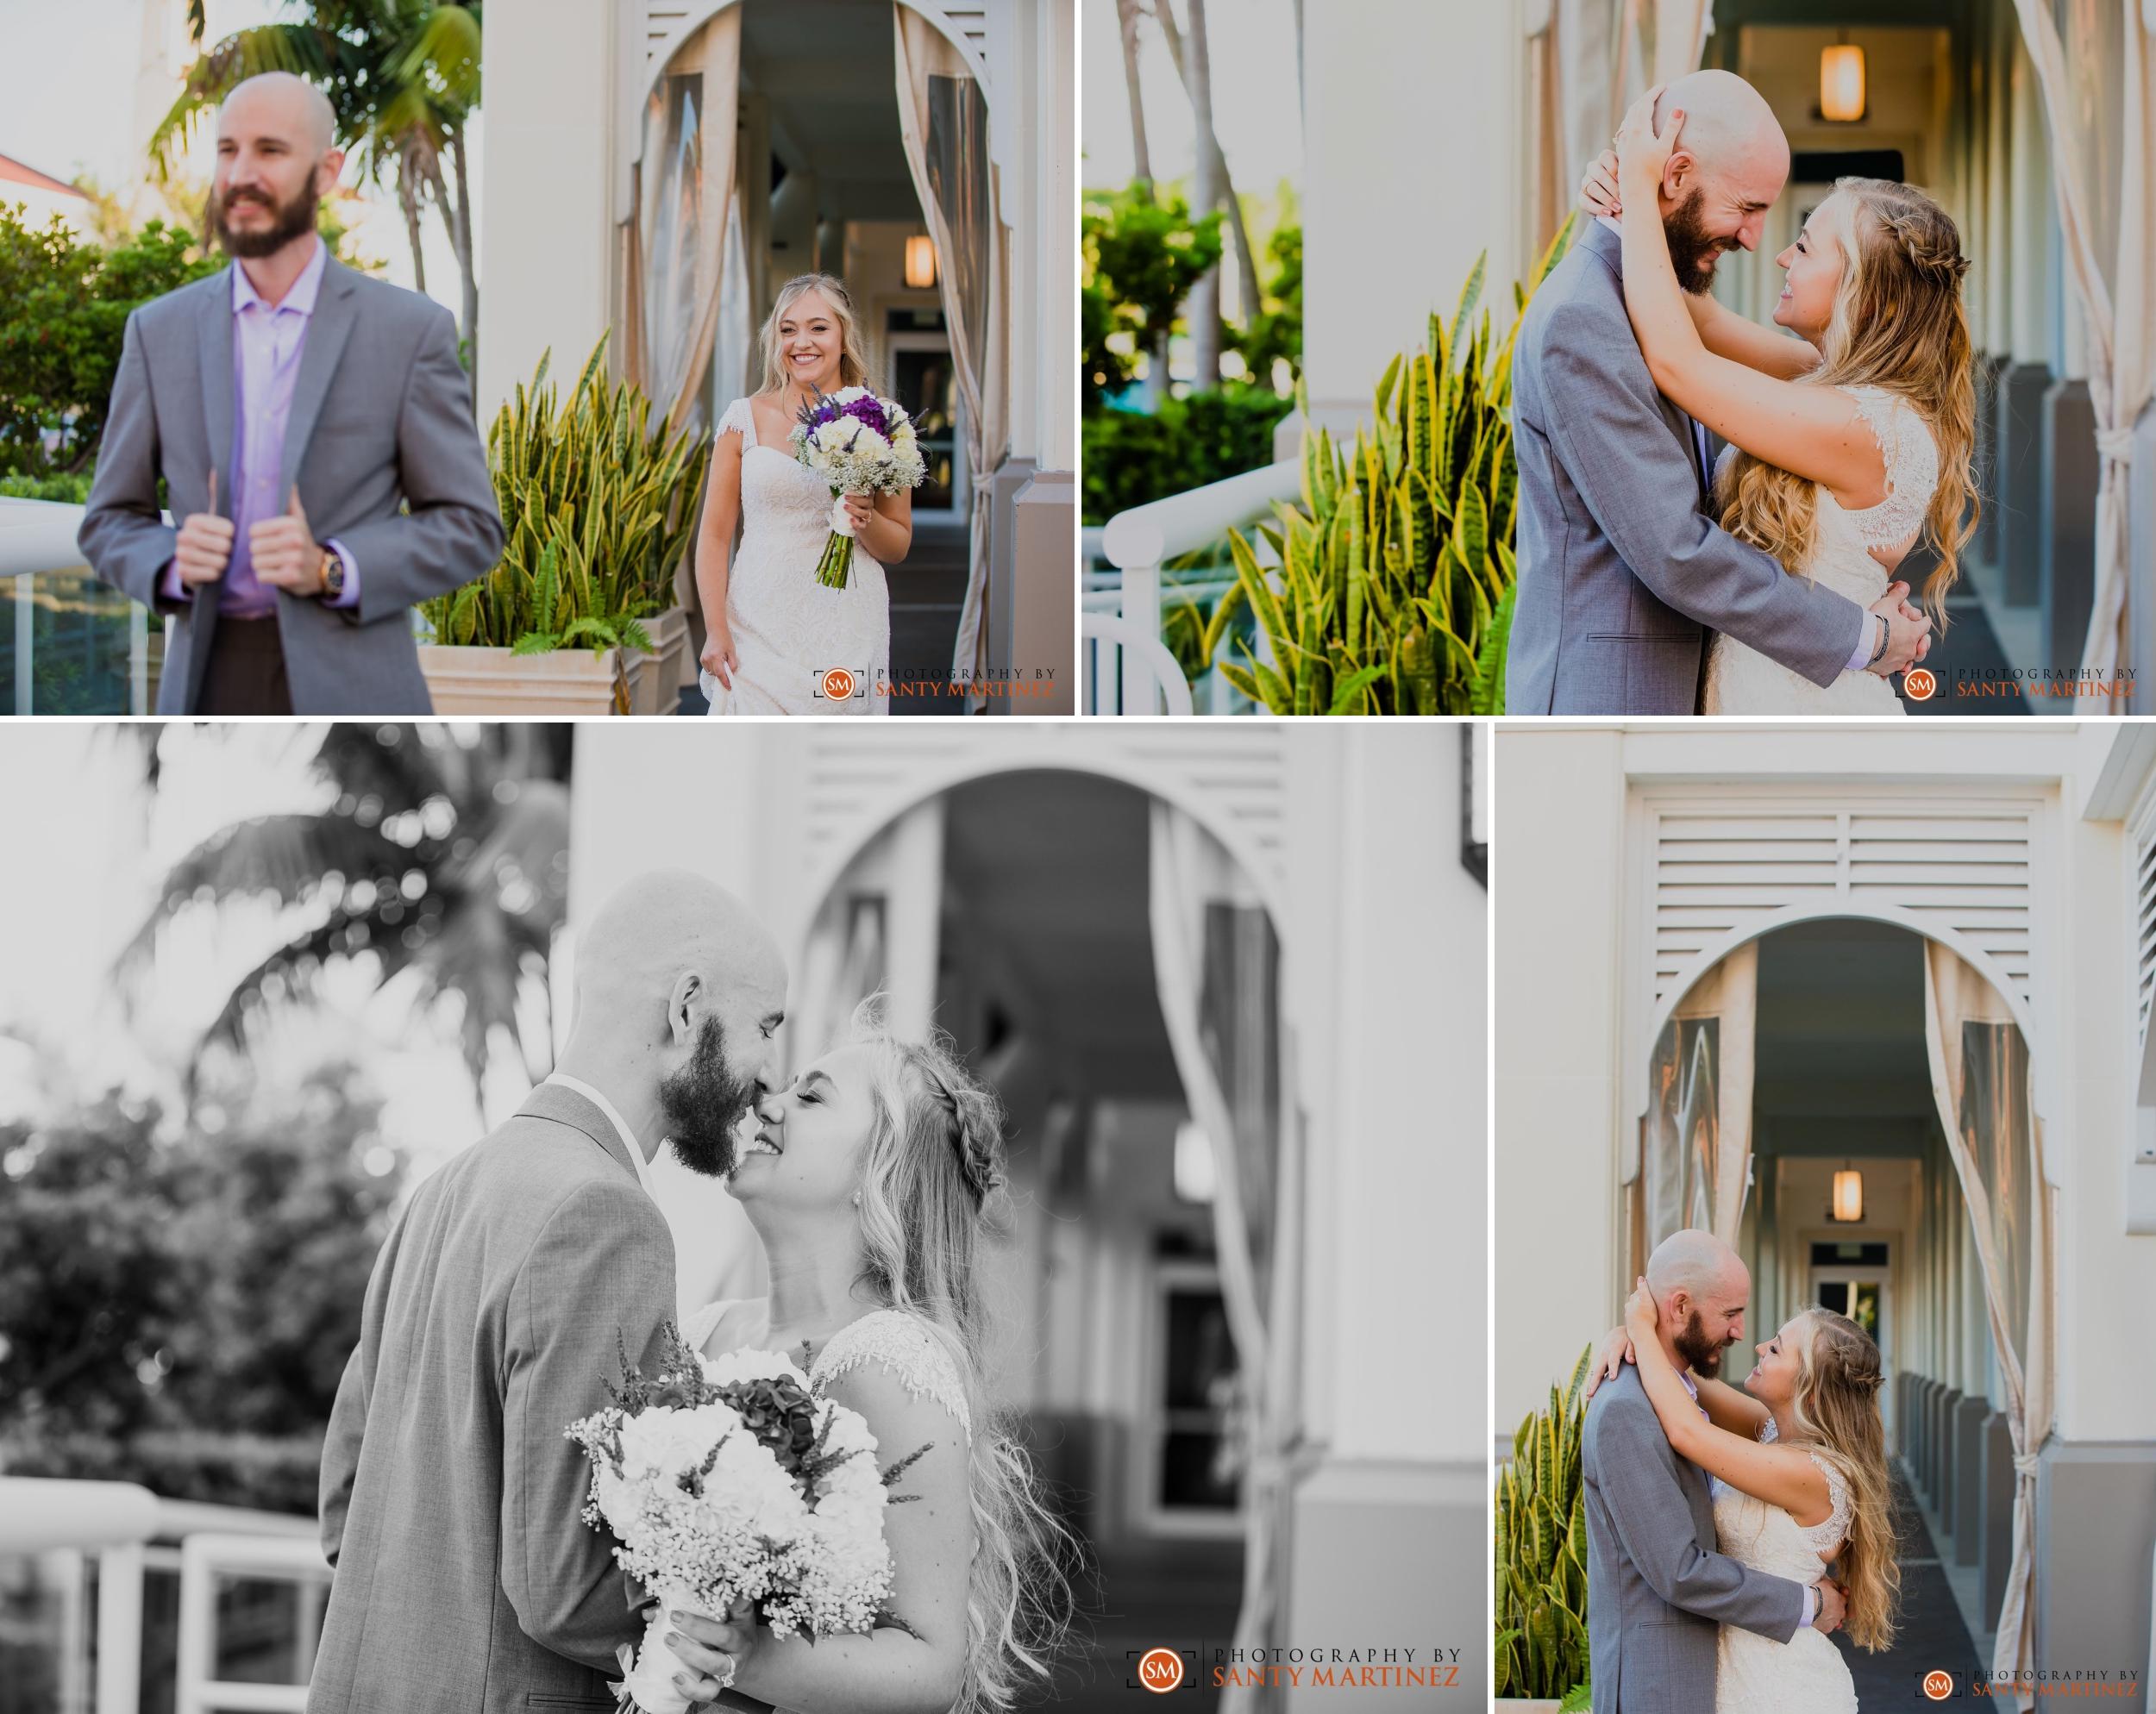 Wedding - Seagate Beach Club - Hotel - Delray Beach - Santy Martinez Photography 5.jpg